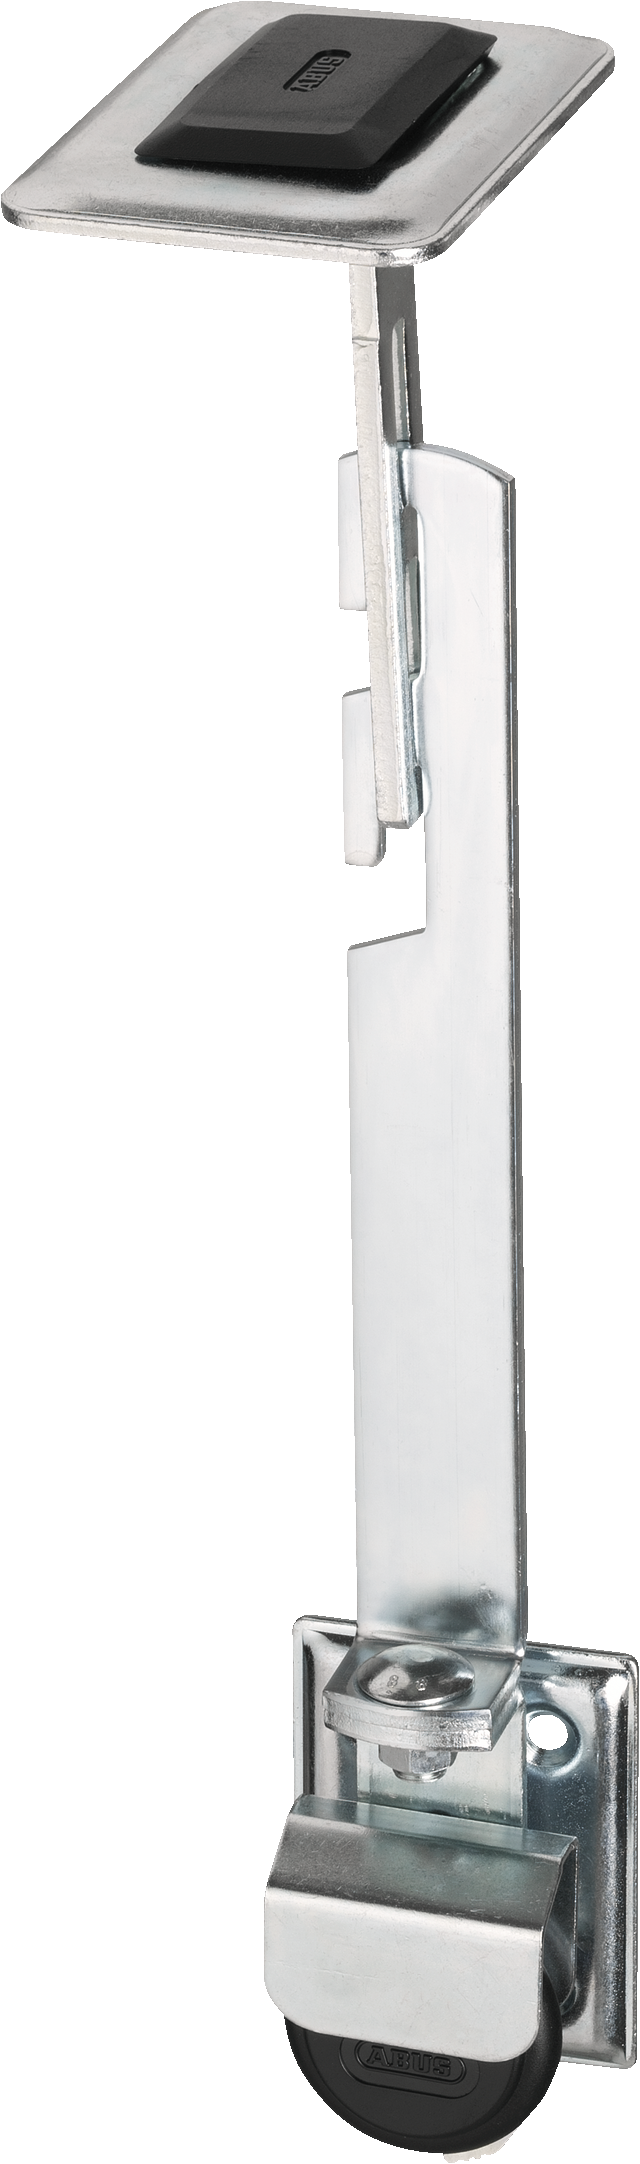 Gitterrostsicherung GS60